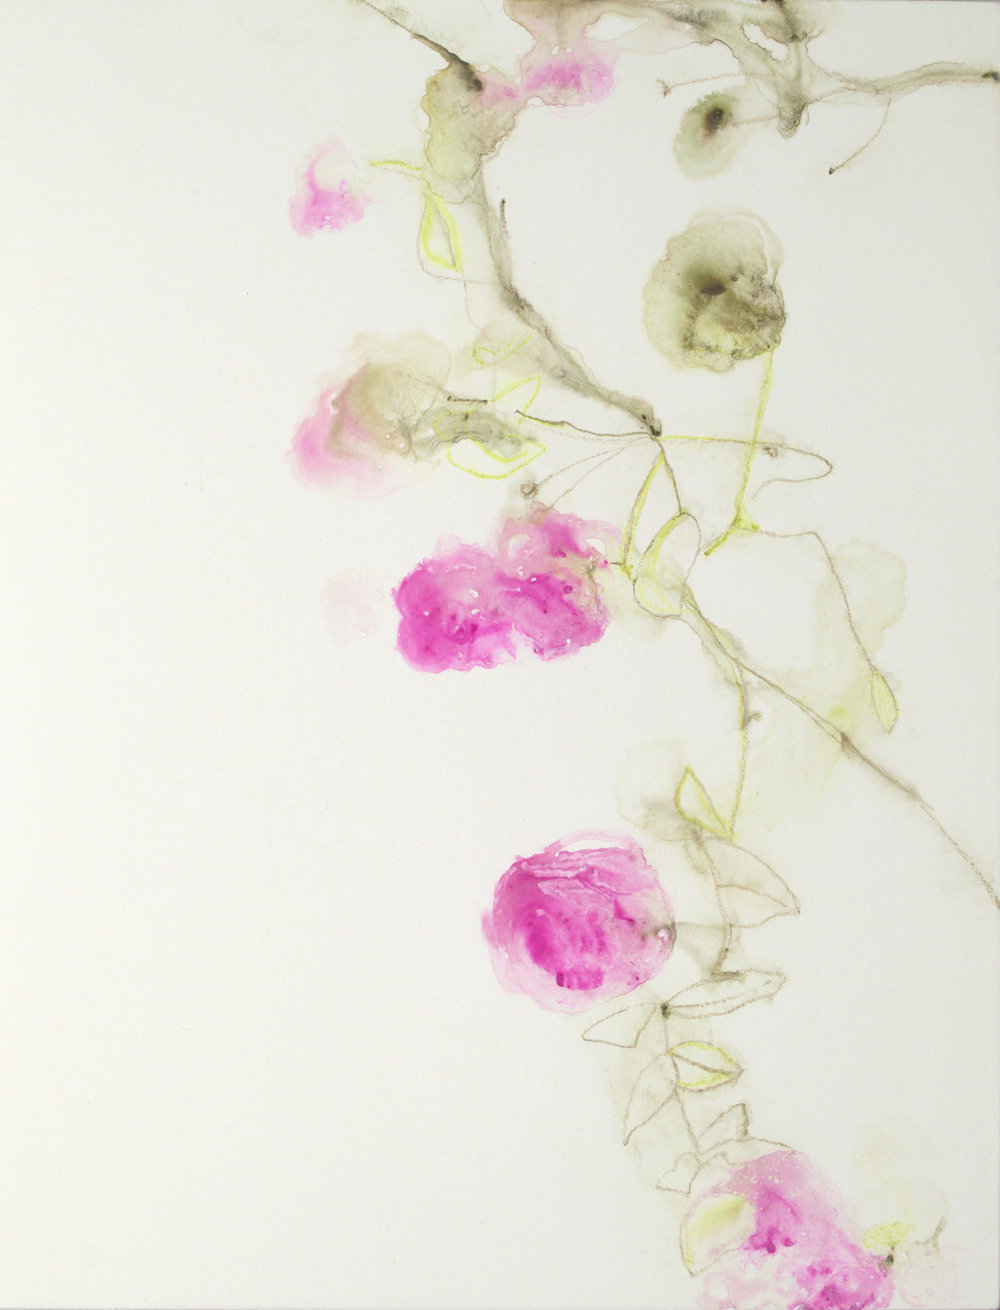 Pink Floral Vine II - 14x11